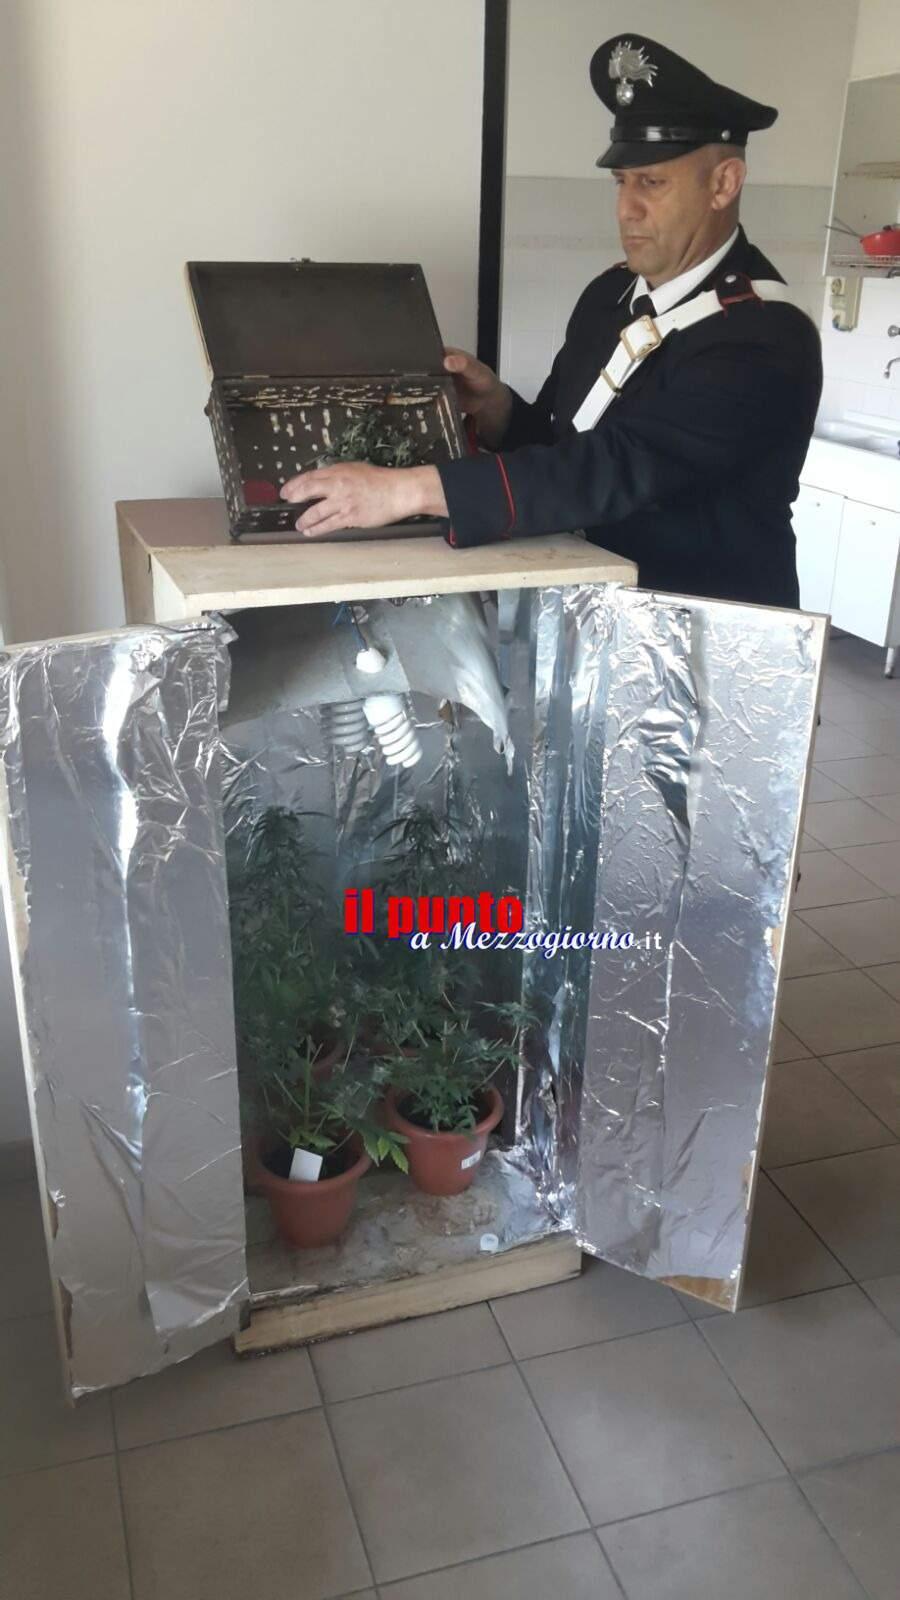 Serra di marijuana in cantina. Due arresti a Piedimonte San Germano